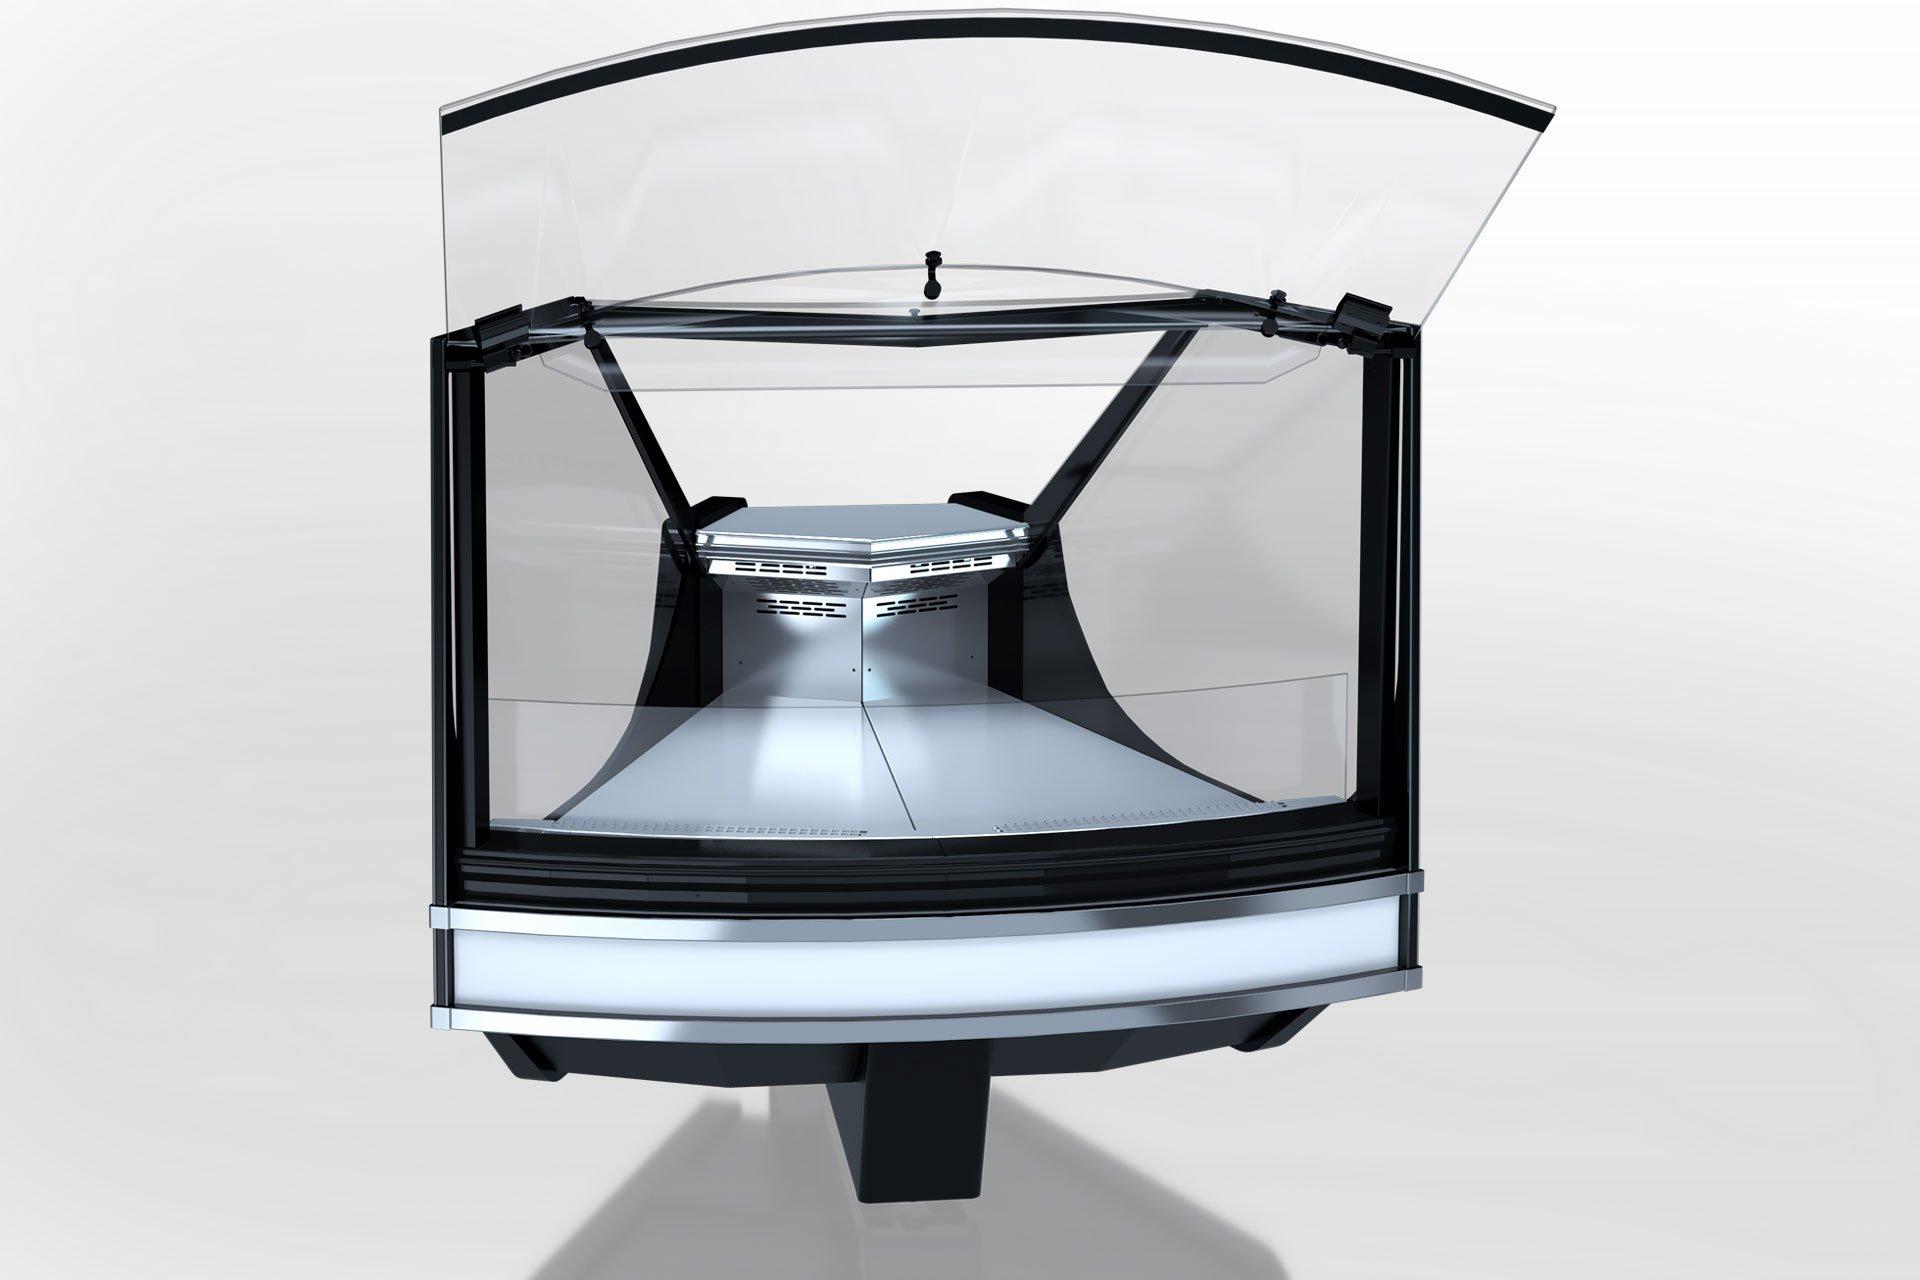 מקרר ויטרינה MISSOURI COLD DIAMOND MC 125 DELI PS/SELF M – ANGULAR ELEMENTS